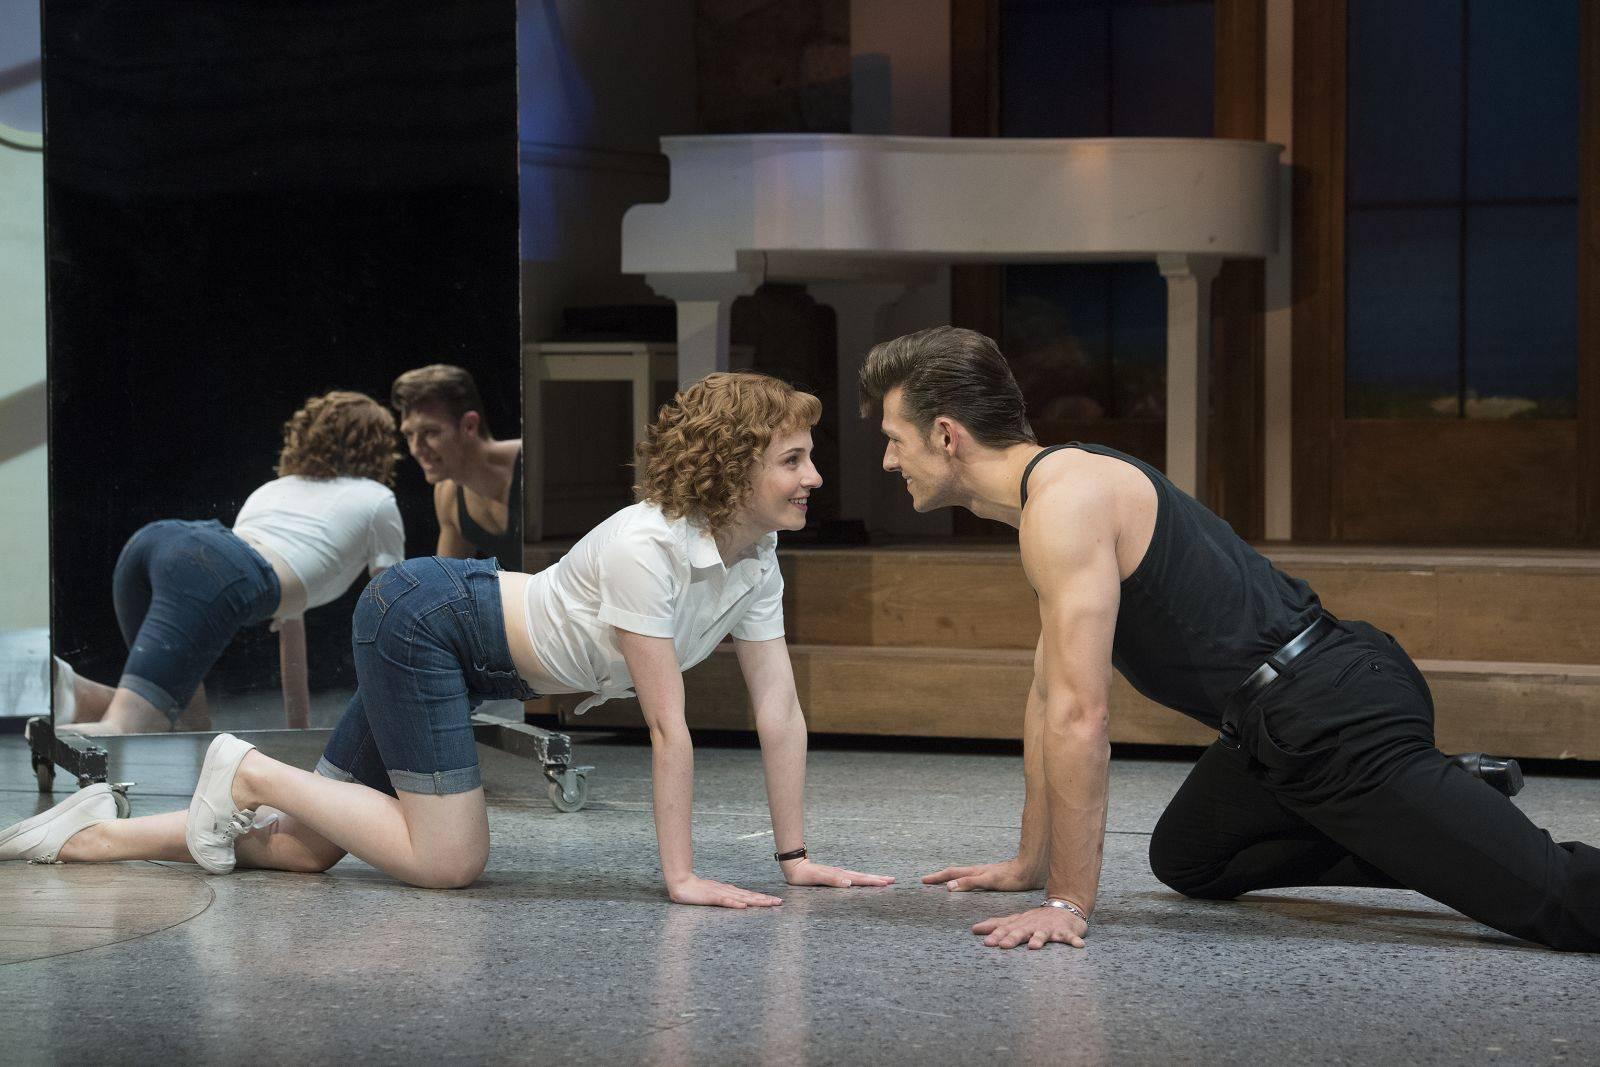 teatro dirty dancing - Viaje cultural a Madrid para la obra de teatro Dirty Dancing